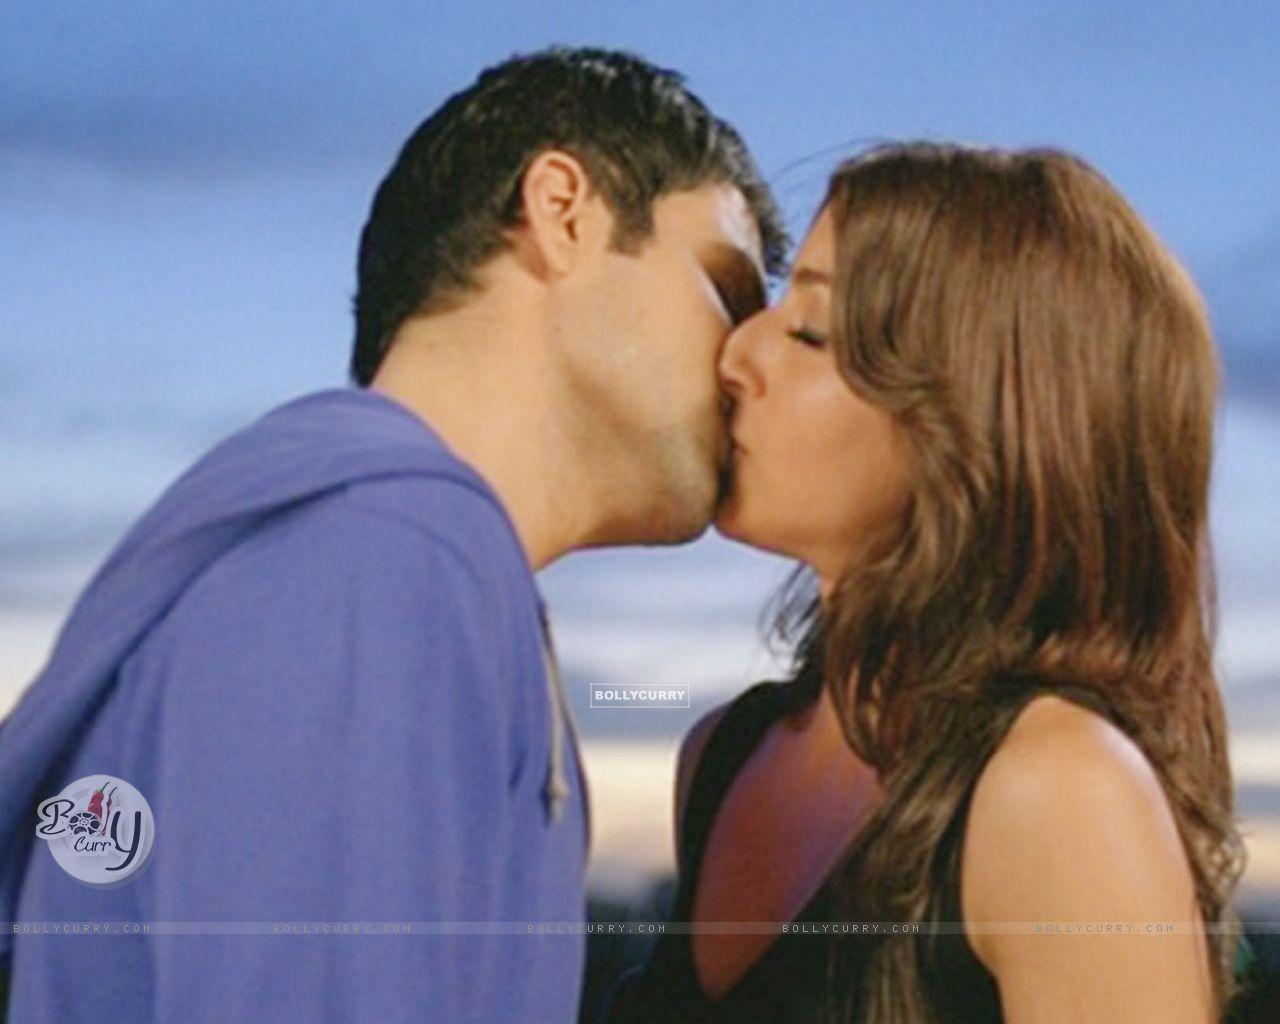 Поцелуи нижние на фото 14 фотография